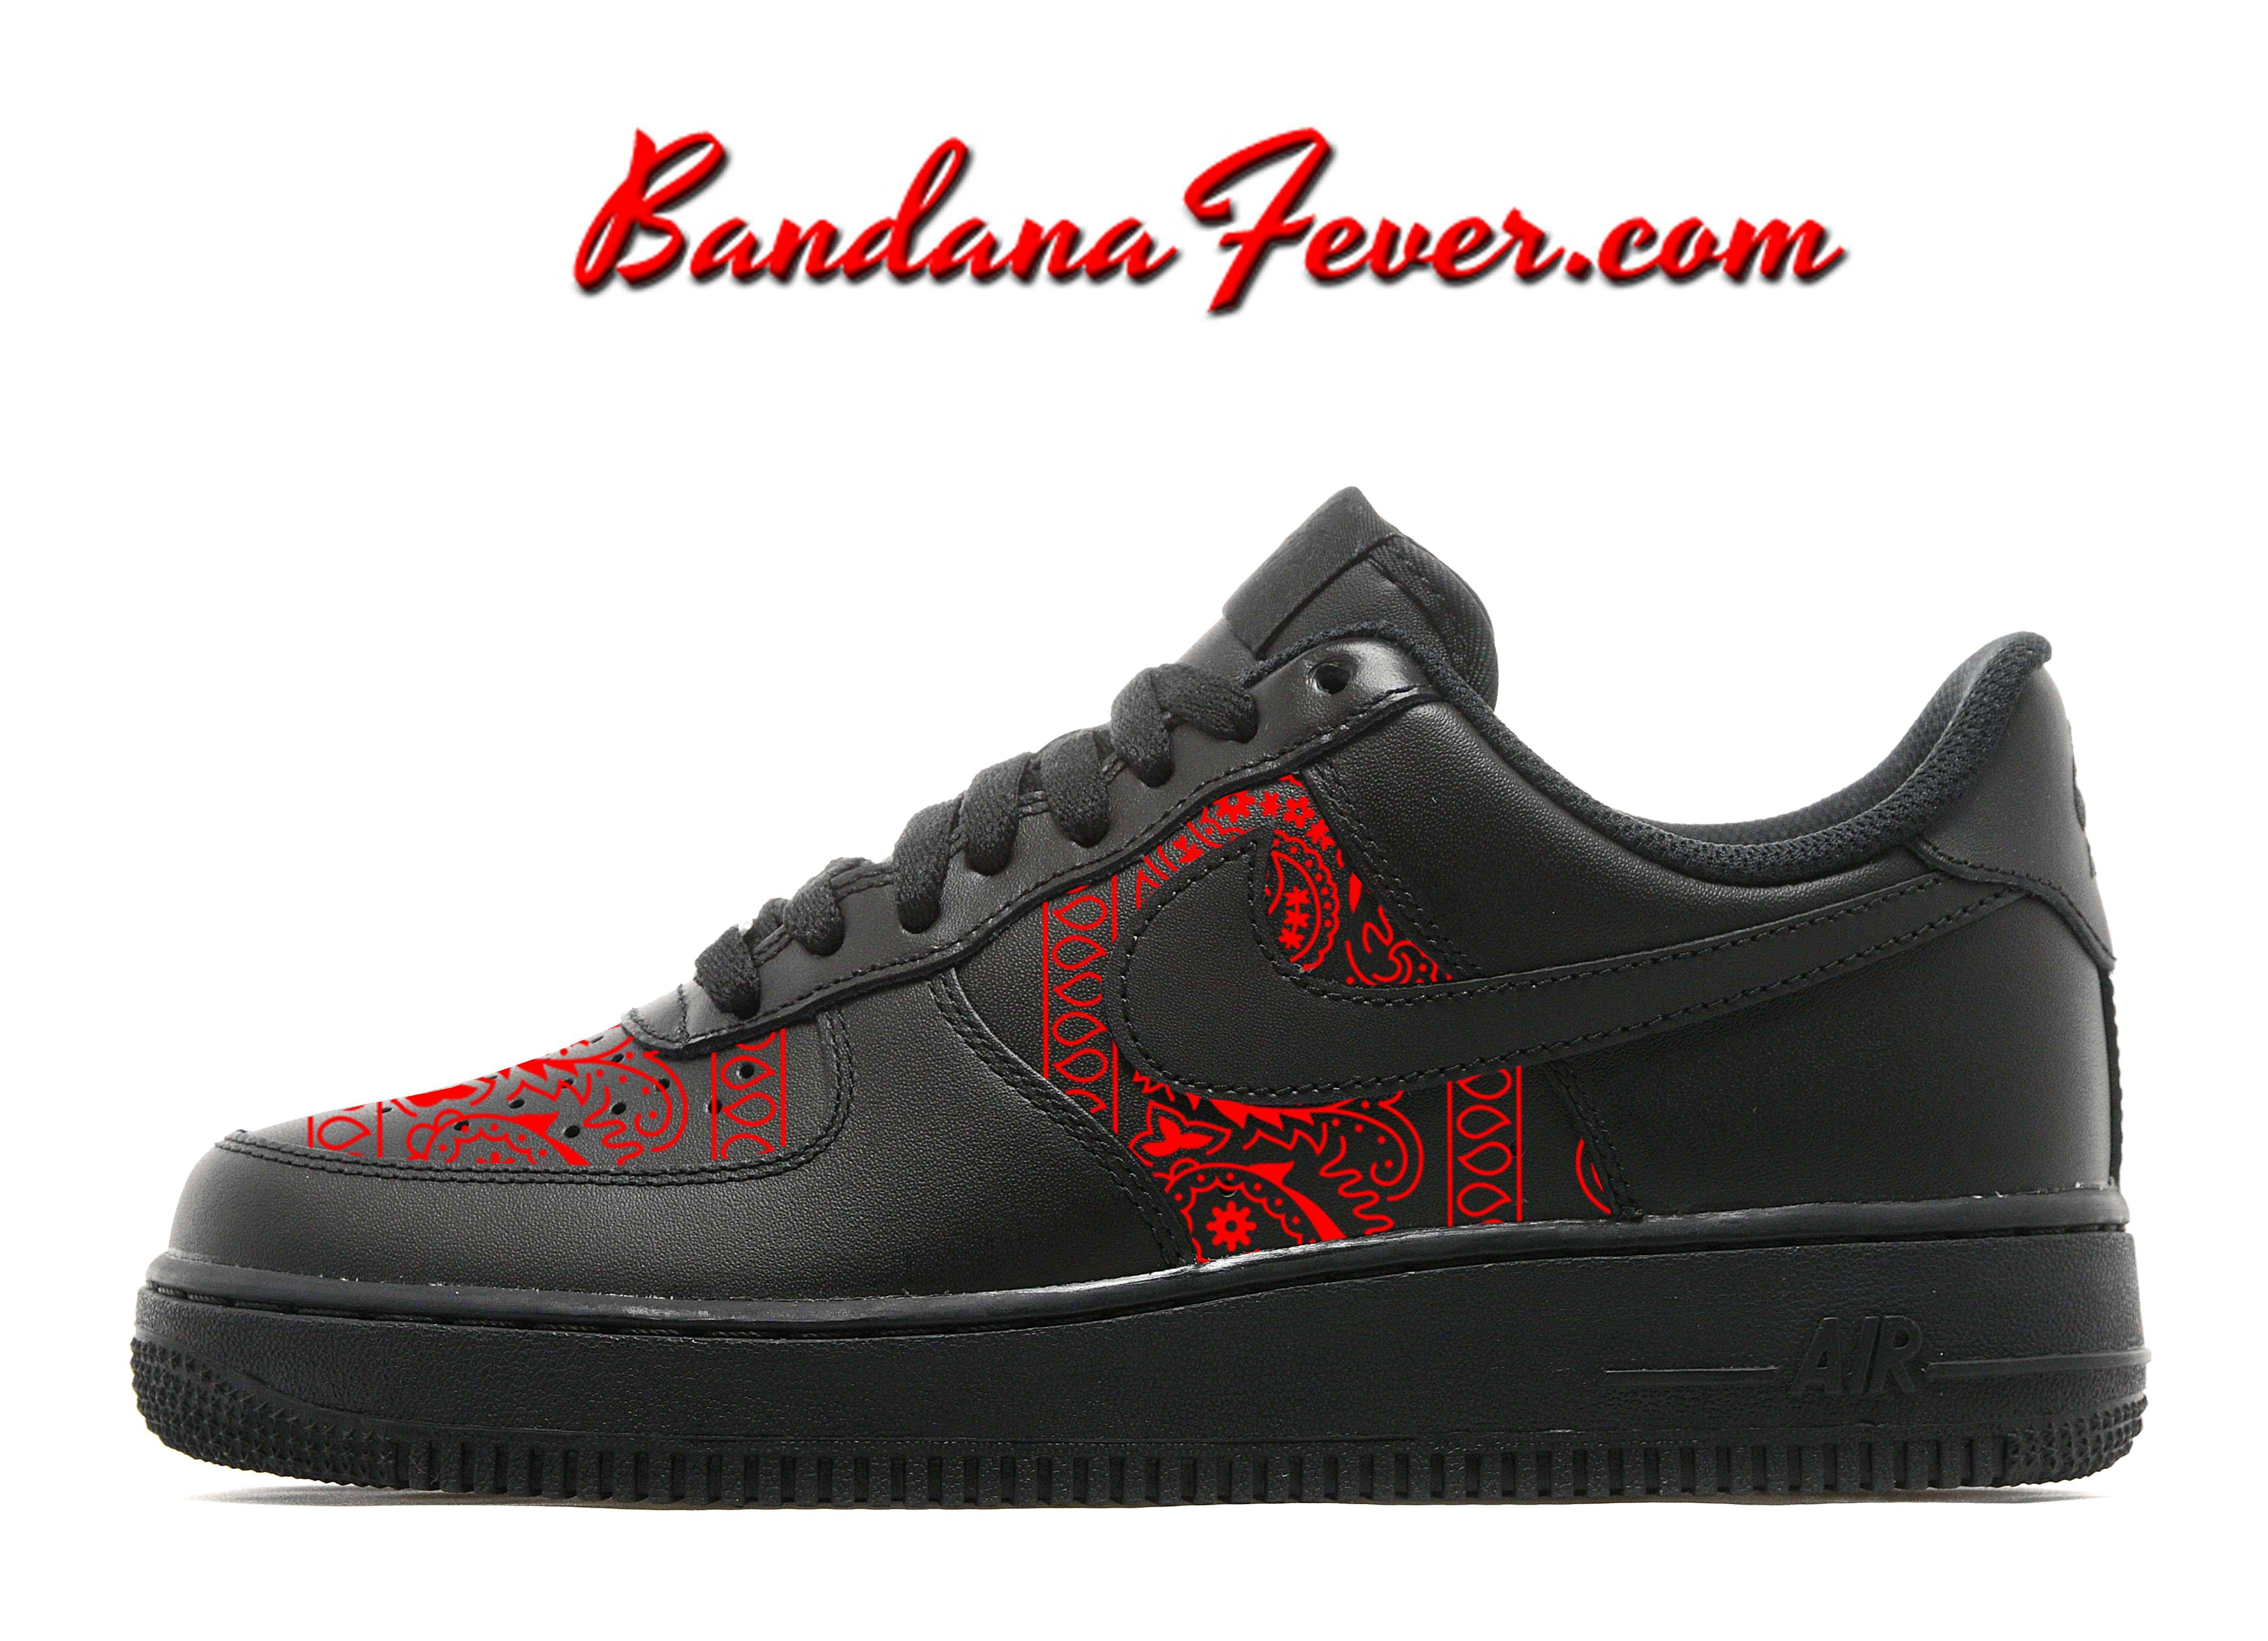 Custom Red Bandana Nike Air Force 1 Shoes Low Black